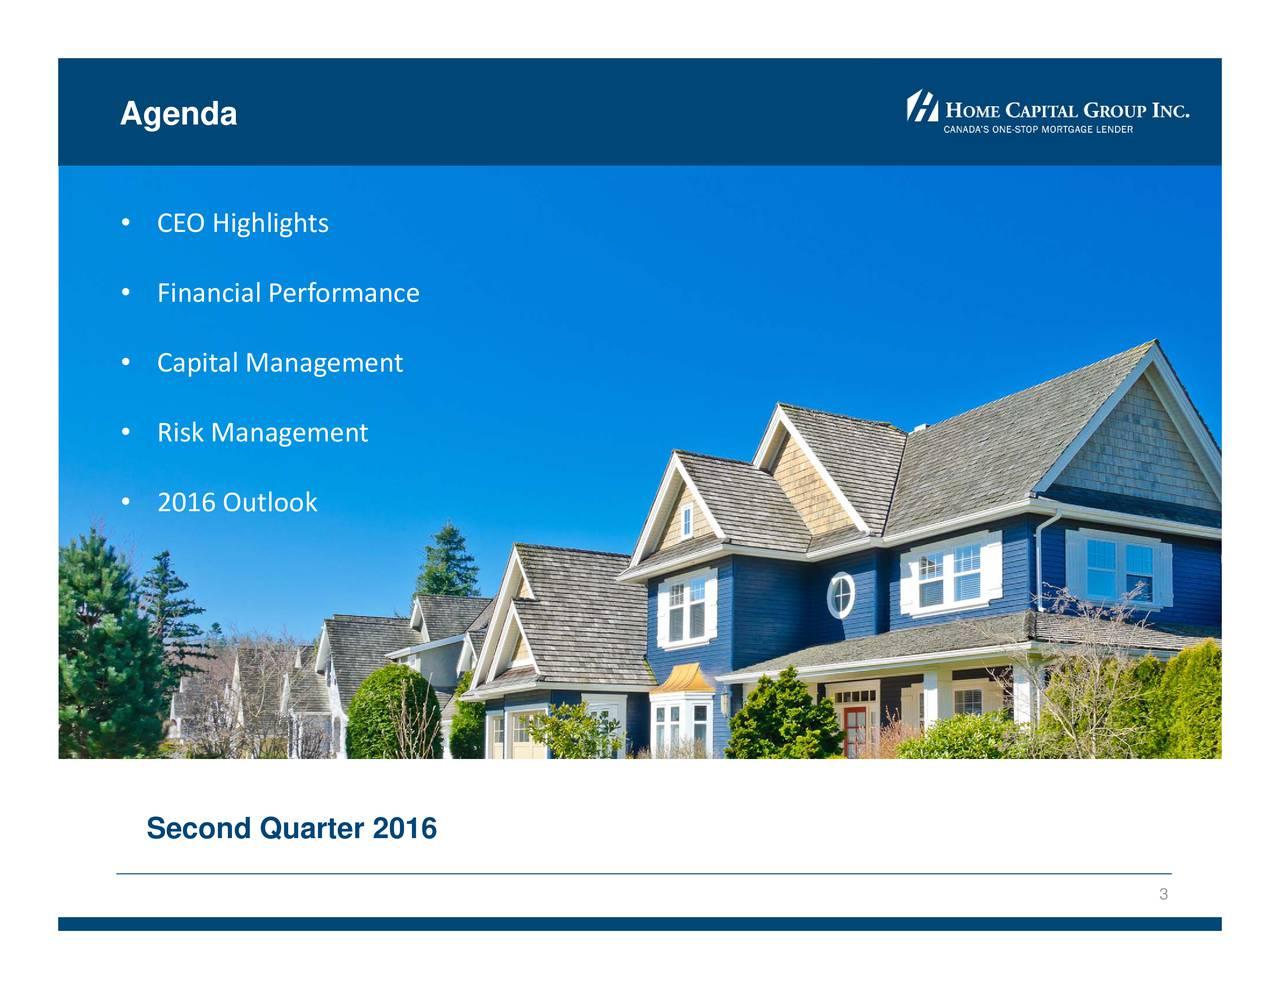 CEO HFihalgCasieRlskMaane6geutlntk Second Quarter 2016 Agenda